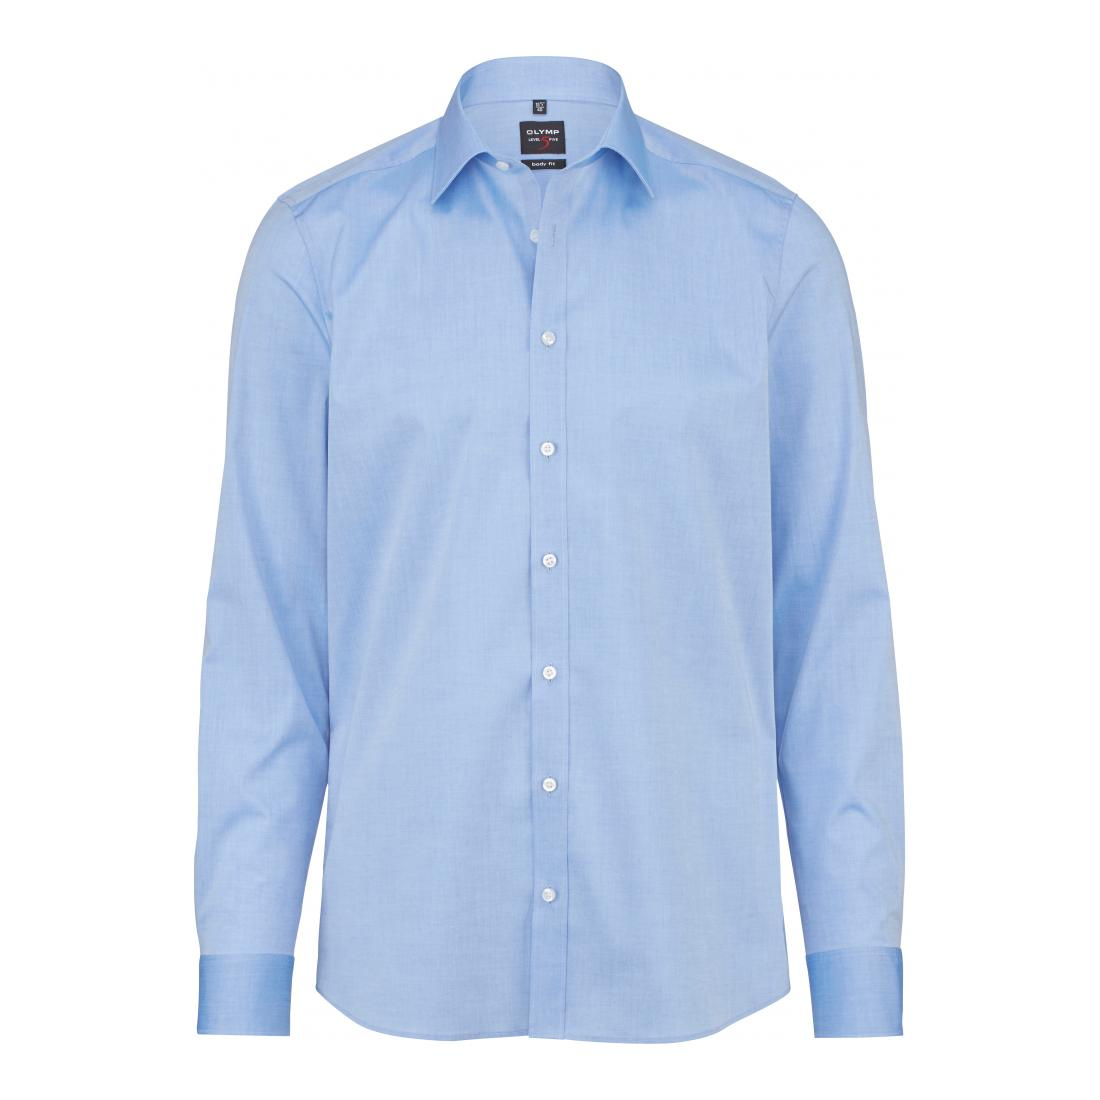 Olymp Business Hemden Herren 2080/64 Hemden